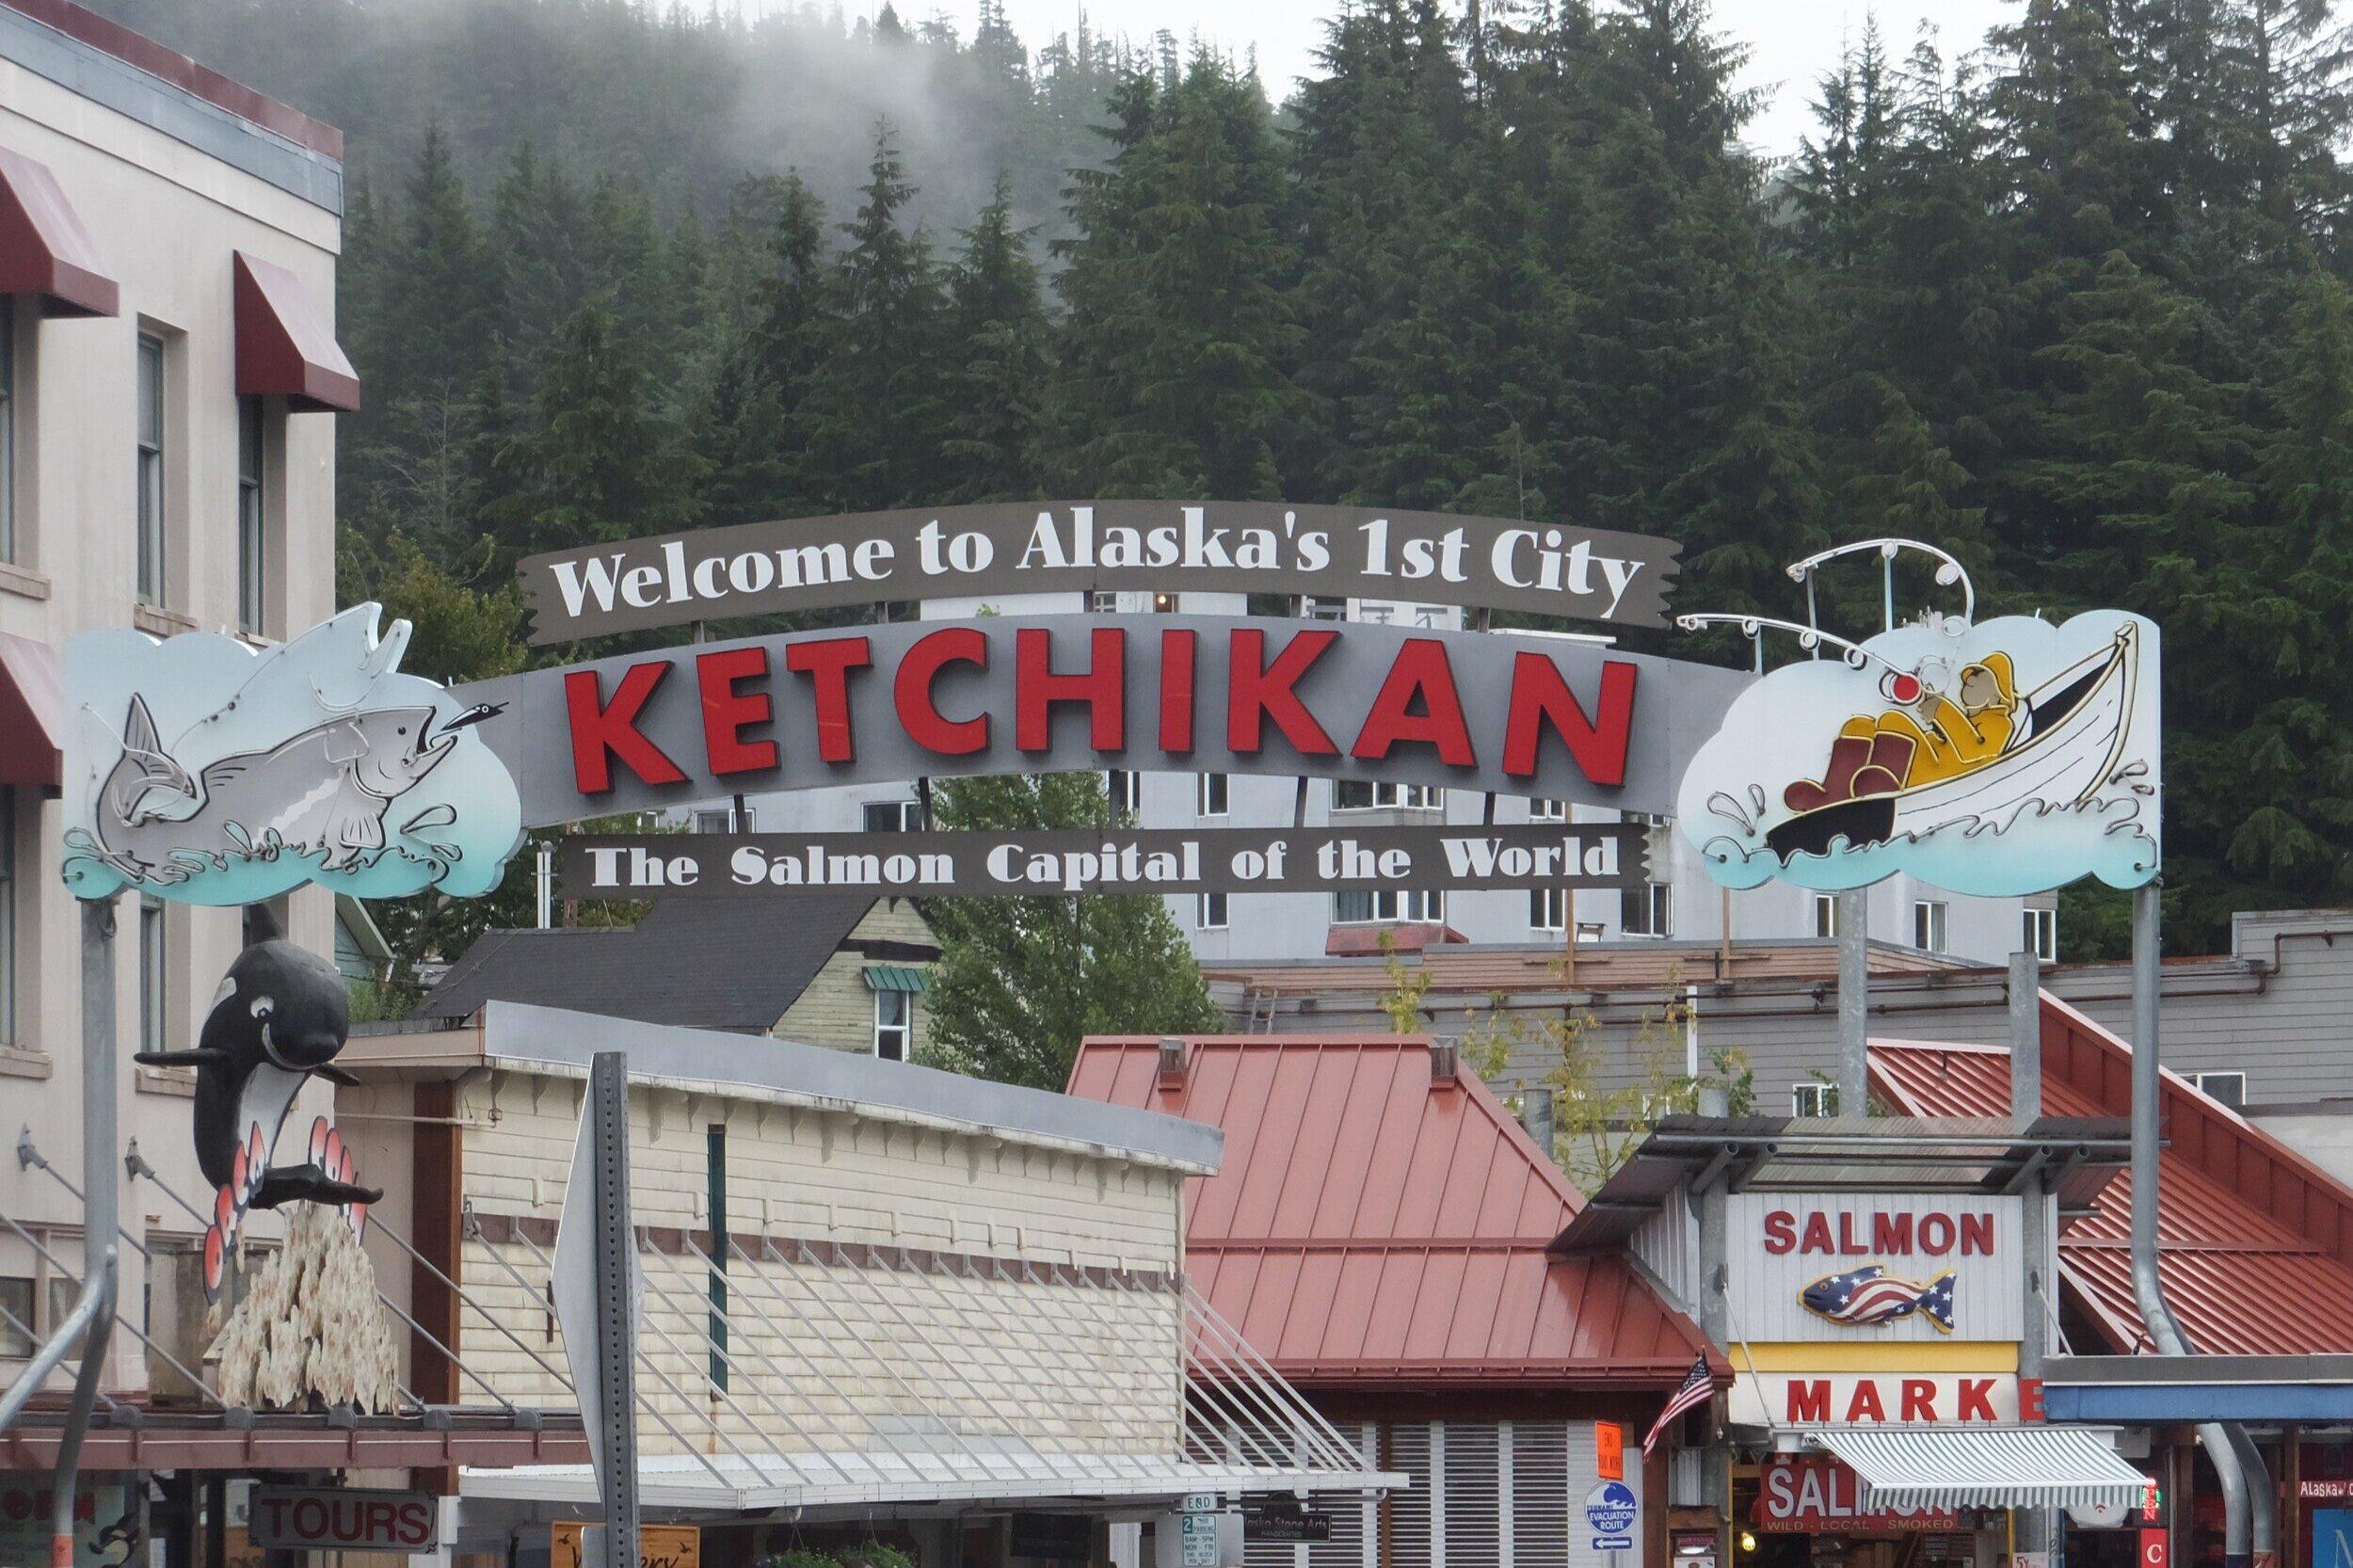 a+view+of+Ketchikan1.jpg